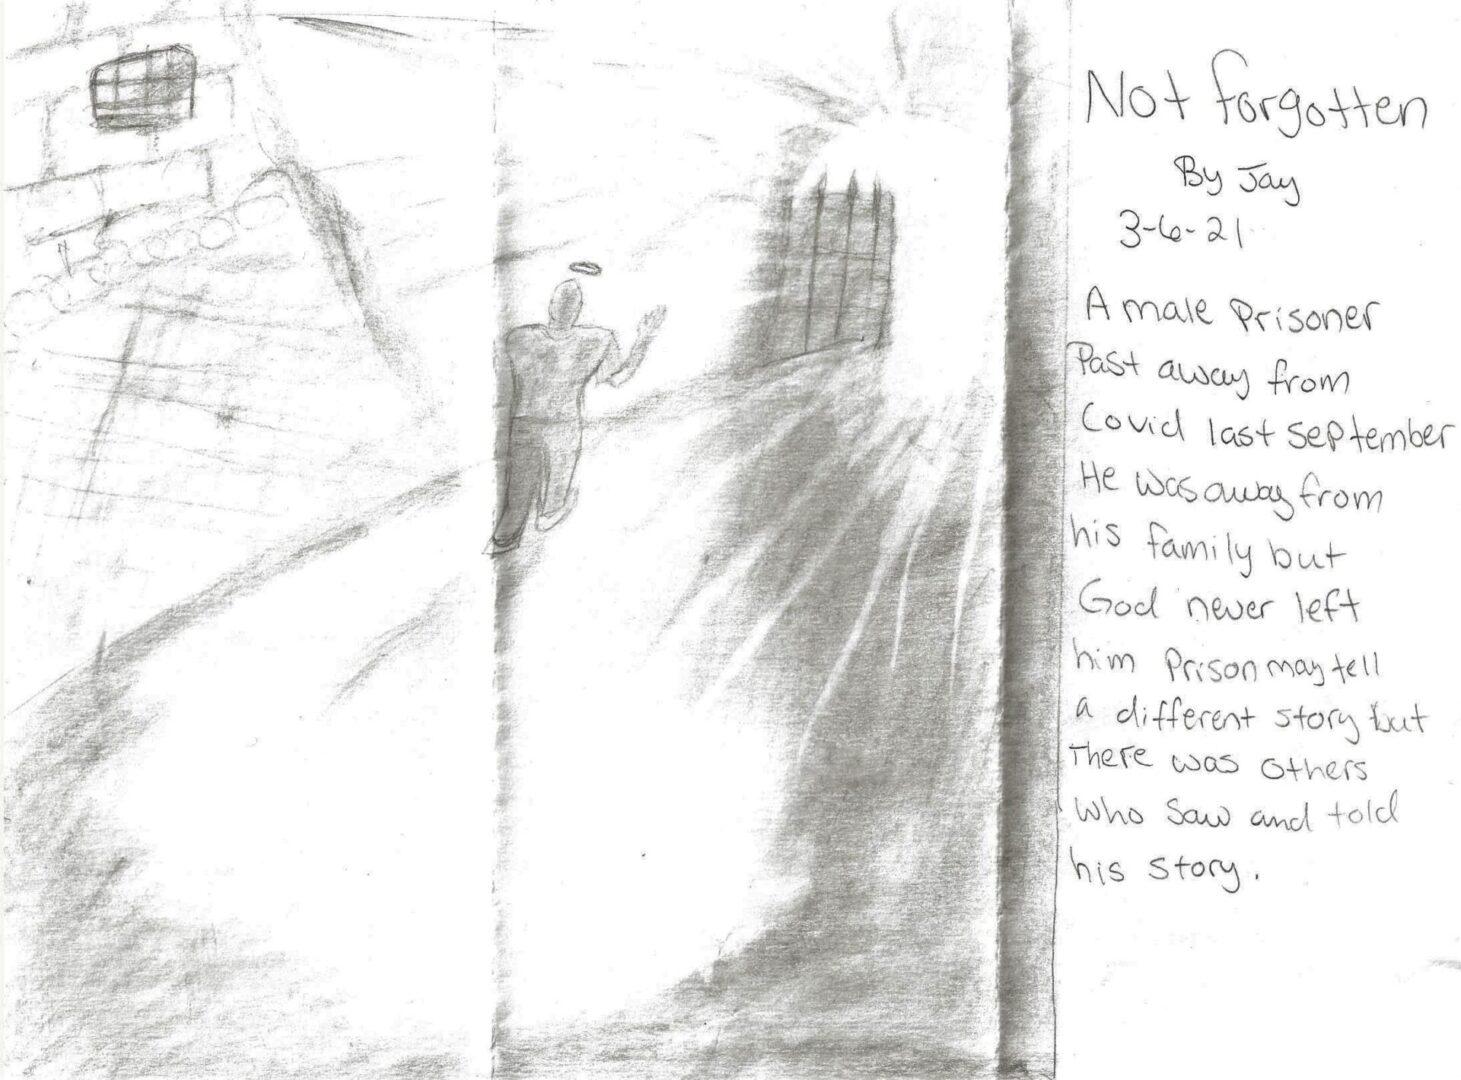 IN MEMORY OF A MALE PRISONER - NOT FORGOTTEN